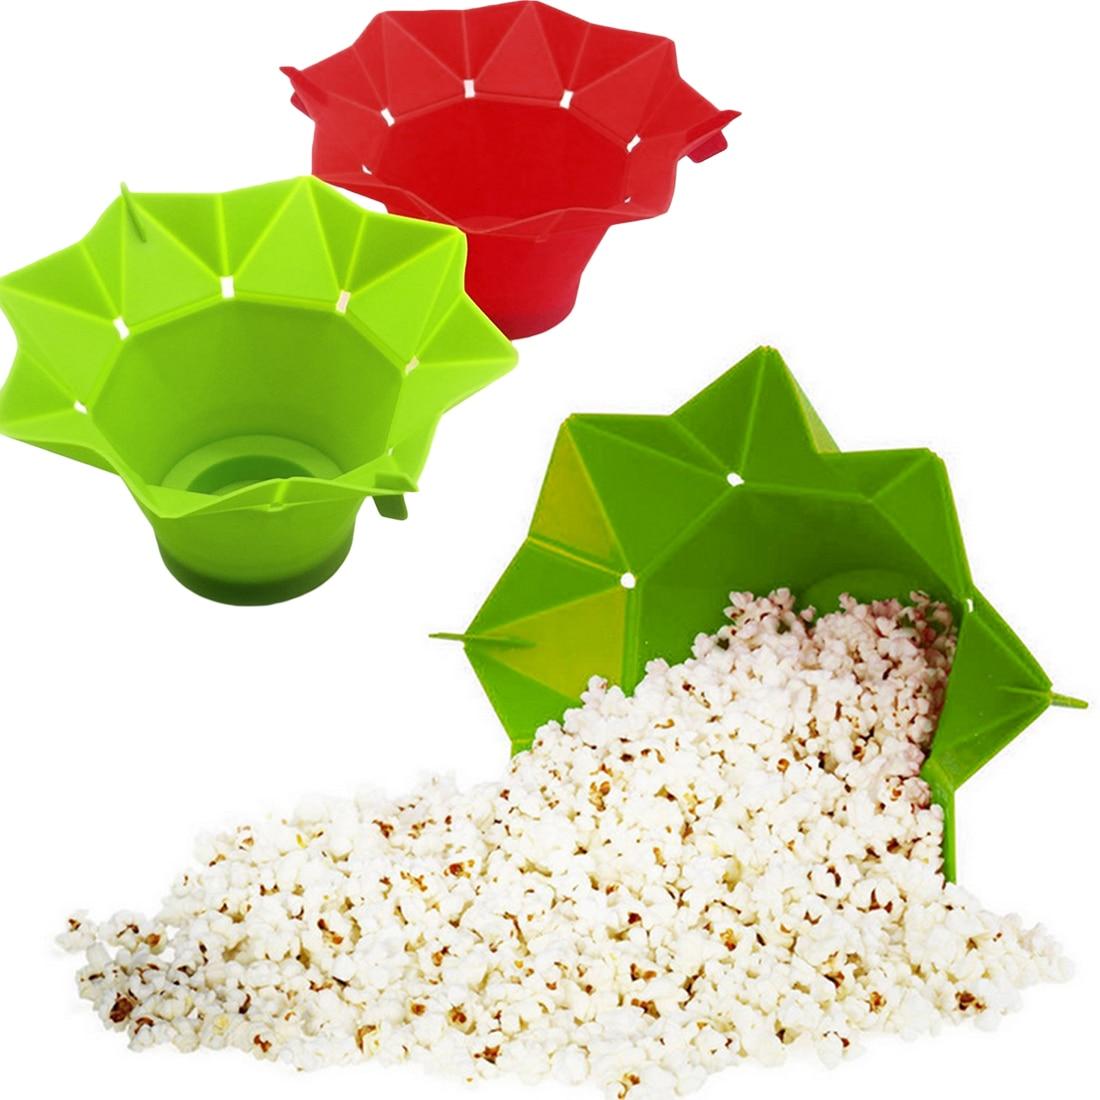 magic microwave silicone popcorn maker